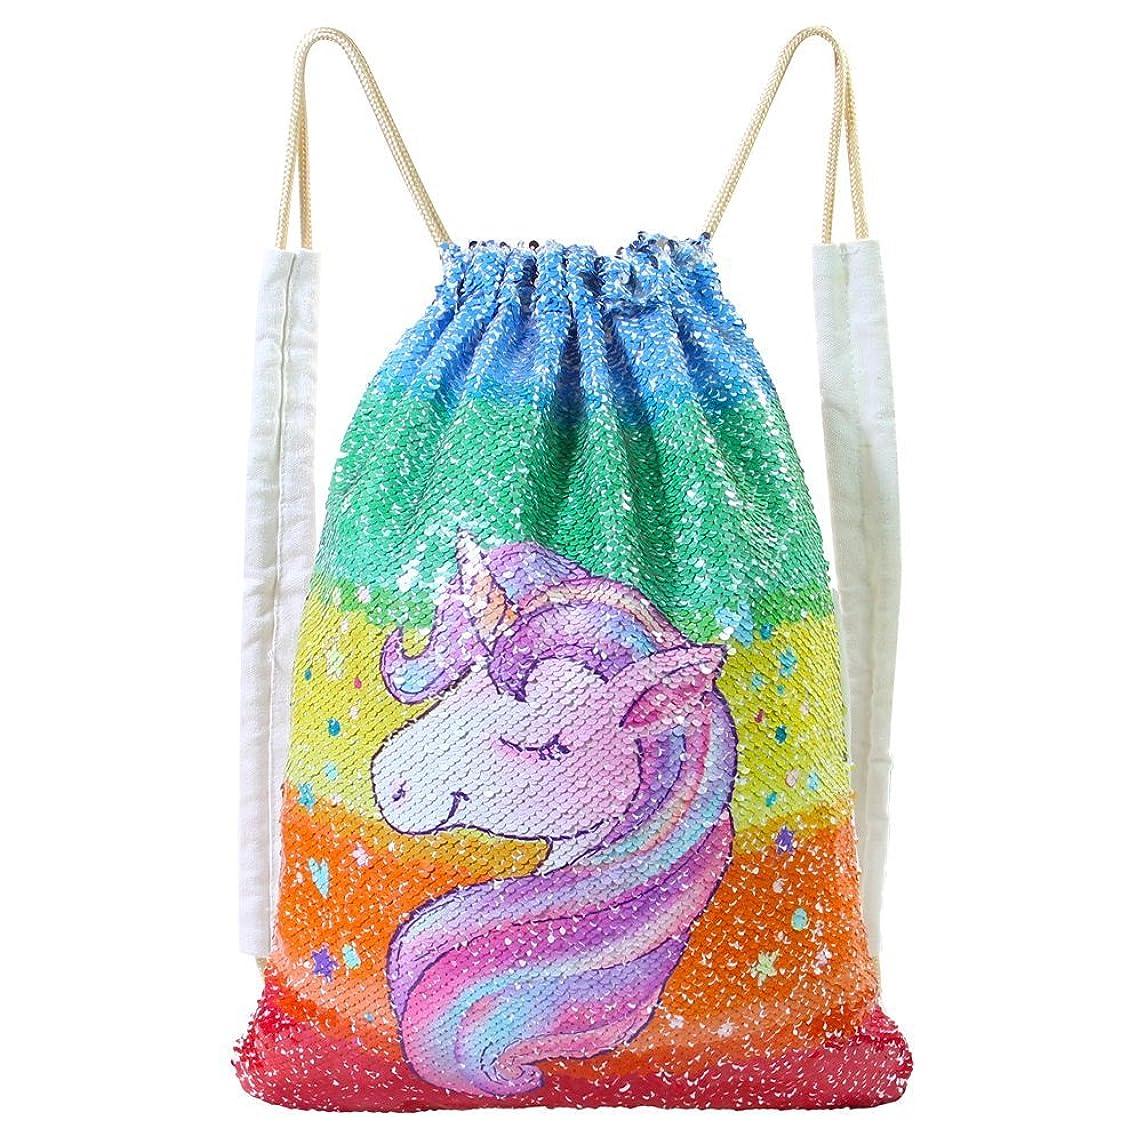 MHJY Sequin Bag Unciorn Drawstring Bag Mermaid Backpack Sparkly Gym Dance Bag Reversible Flip Sequin Bling Backpack for Hiking Beach Travel Bags